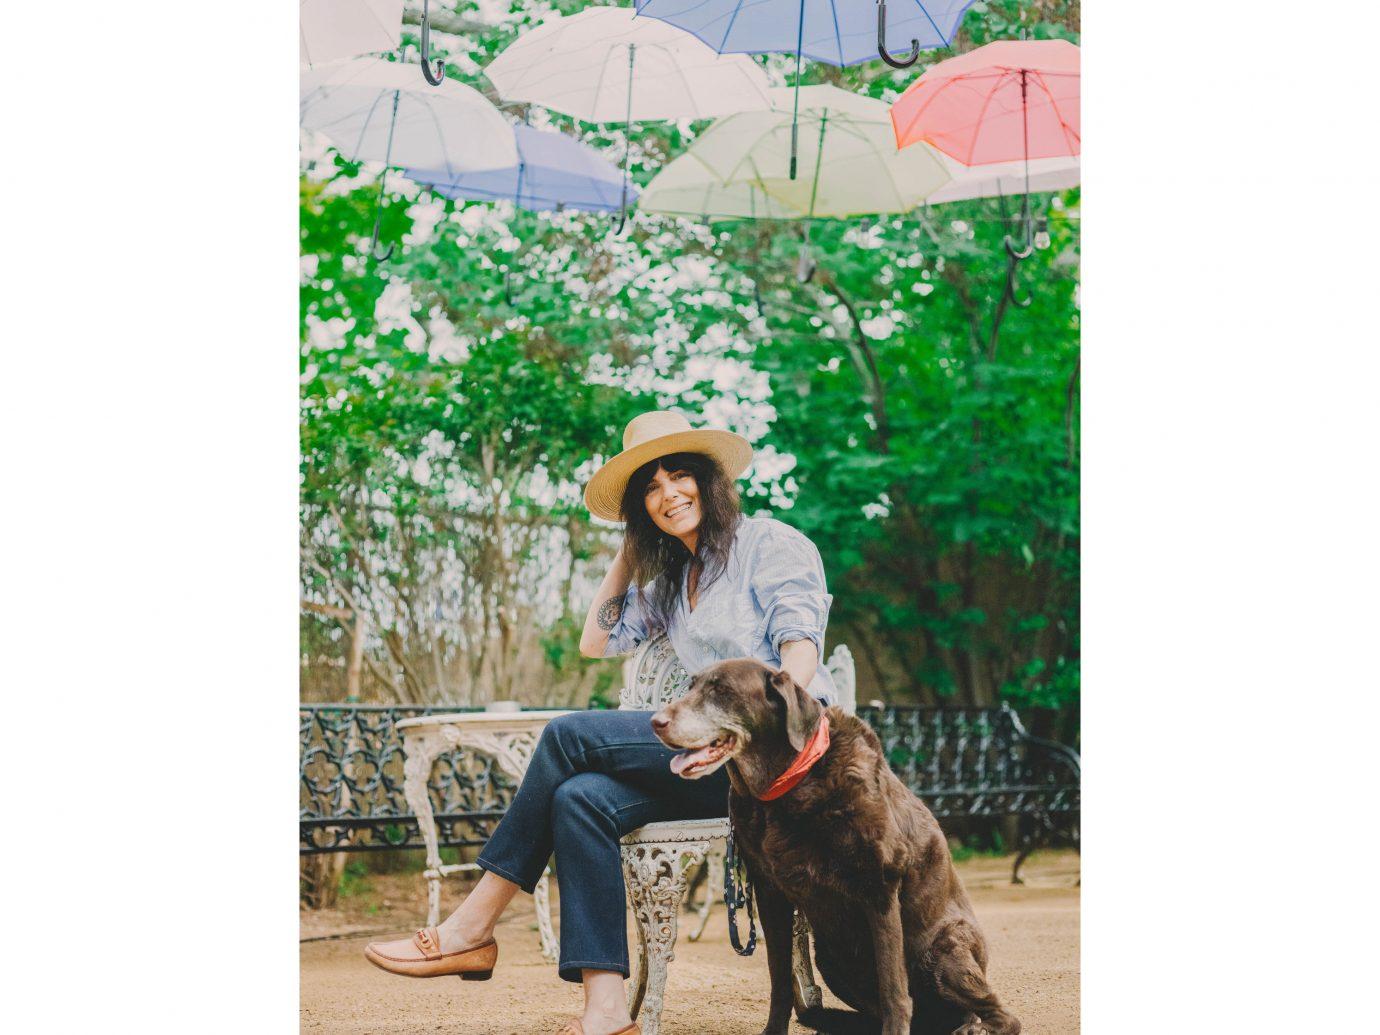 Dog photograph outdoor person mammal vertebrate snapshot tree fun plant umbrella dog like mammal vacation